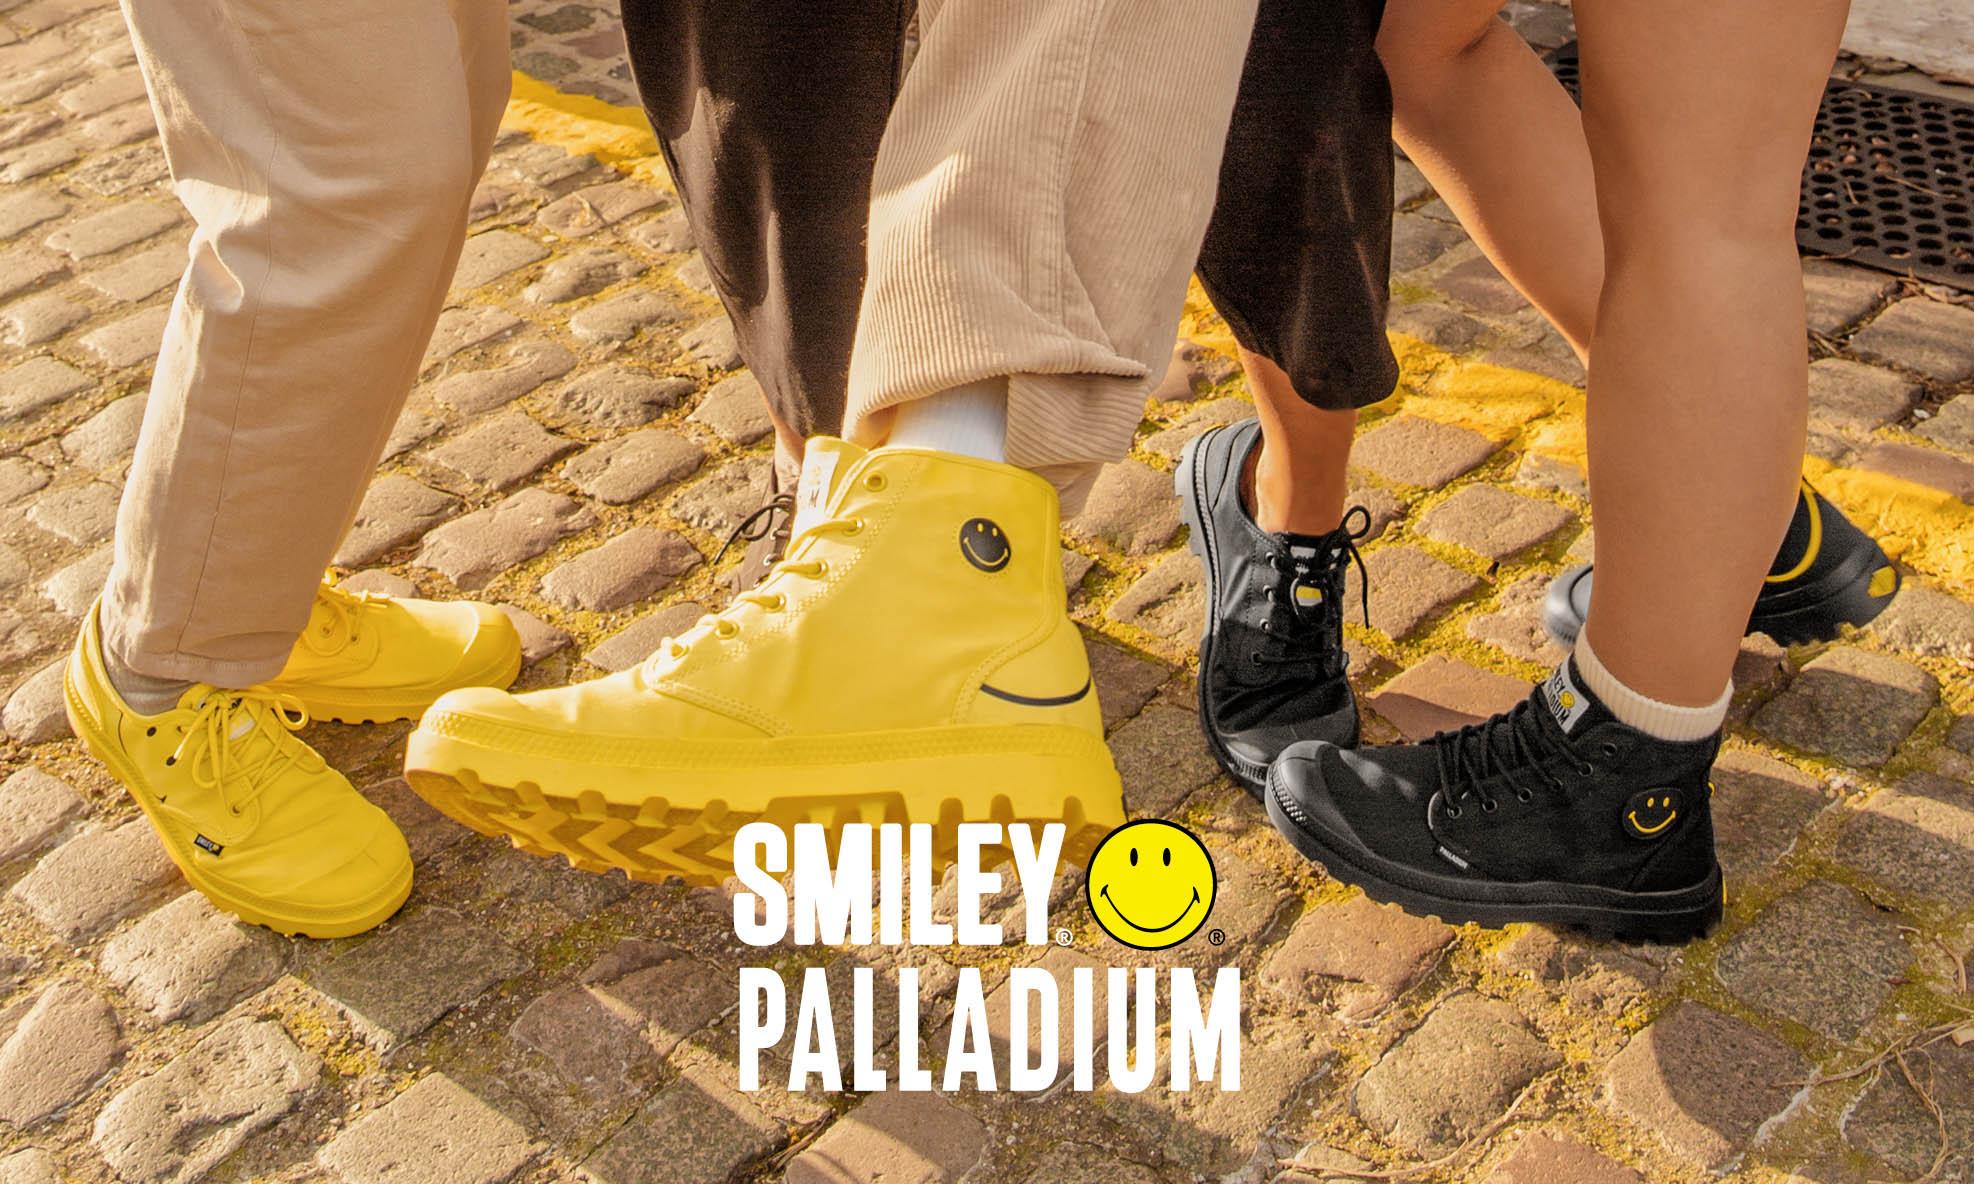 Palladium x Smiley 联名系列发布